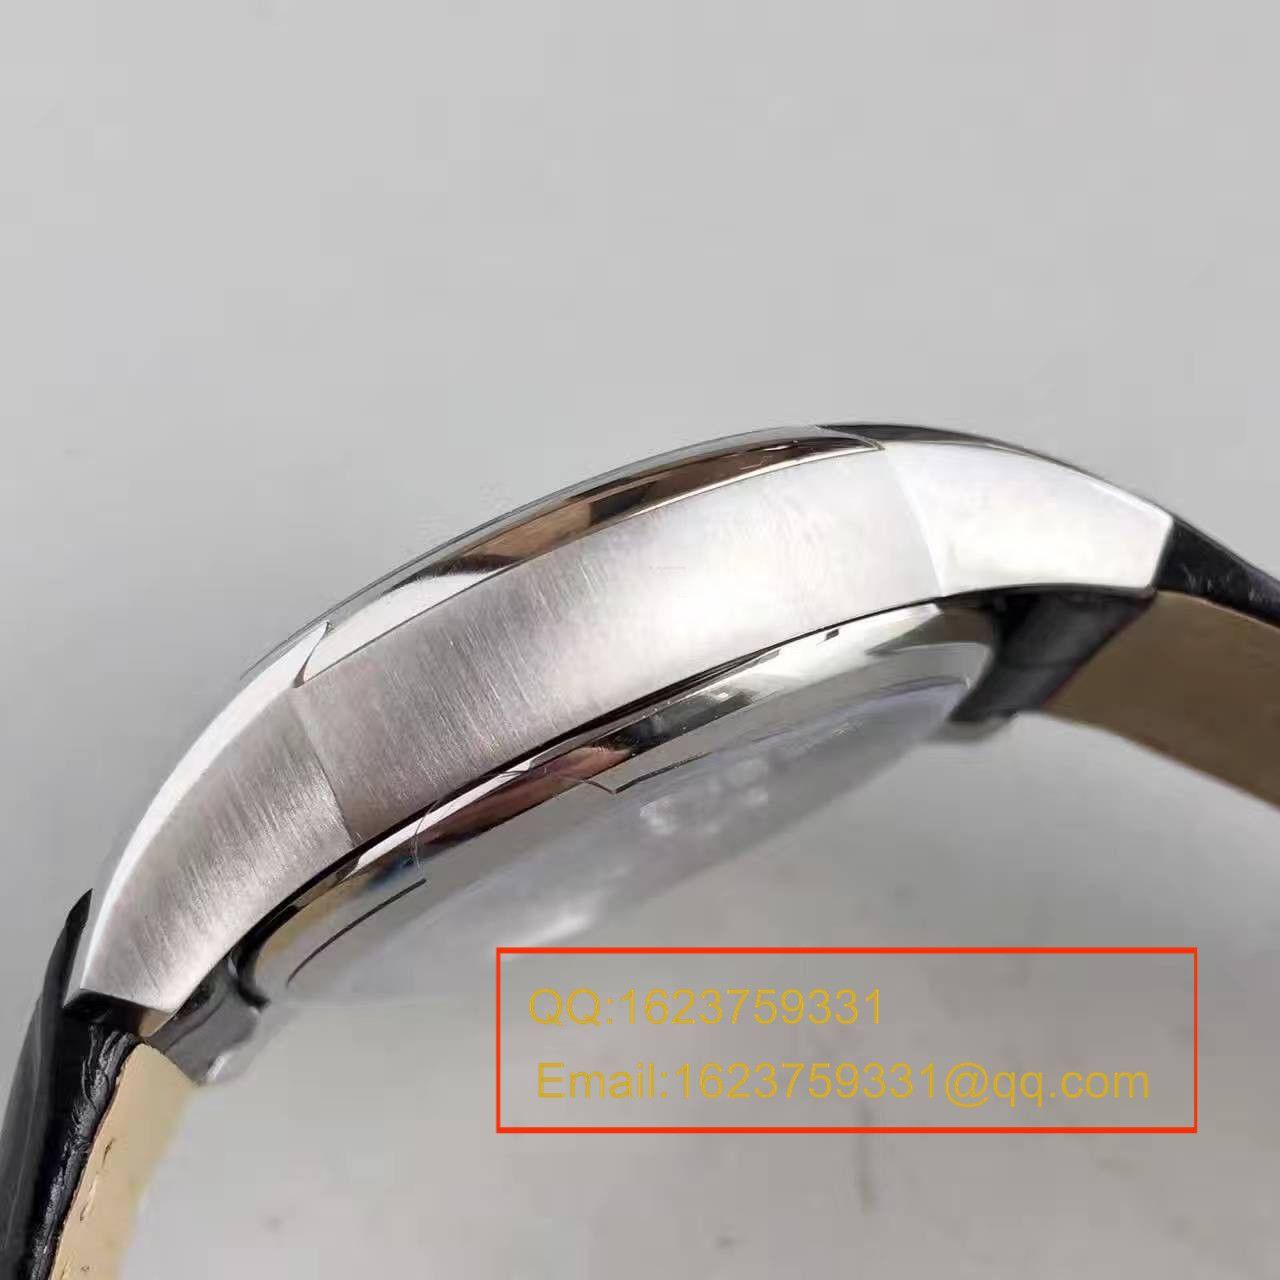 【SSS厂一比一复刻手表】欧米茄碟飞系列431.13.41.21.01.001腕表 / M231